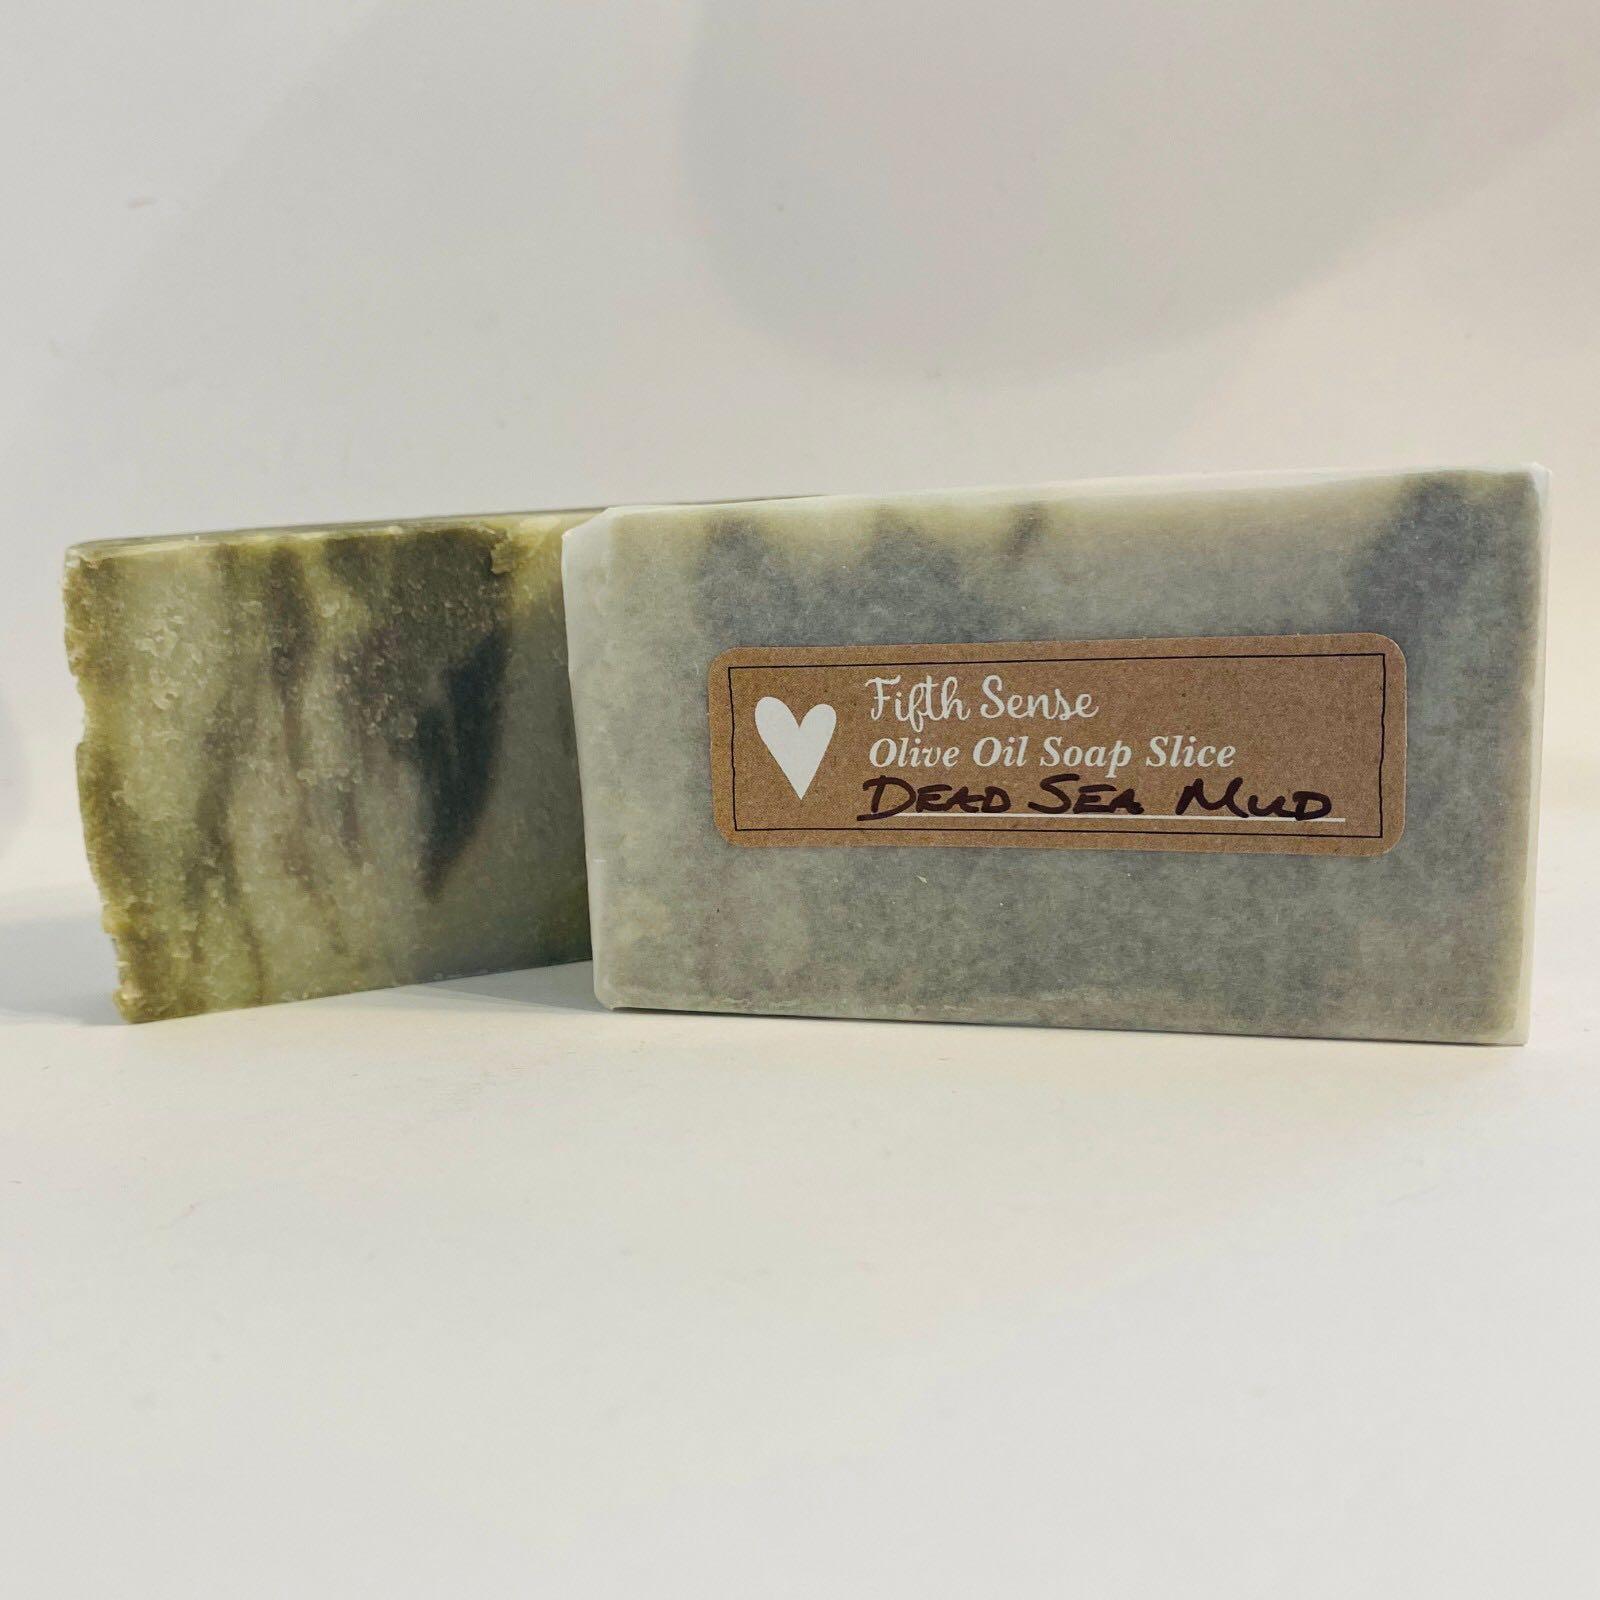 Dead Sea Mud Olive Oil Soap Slice